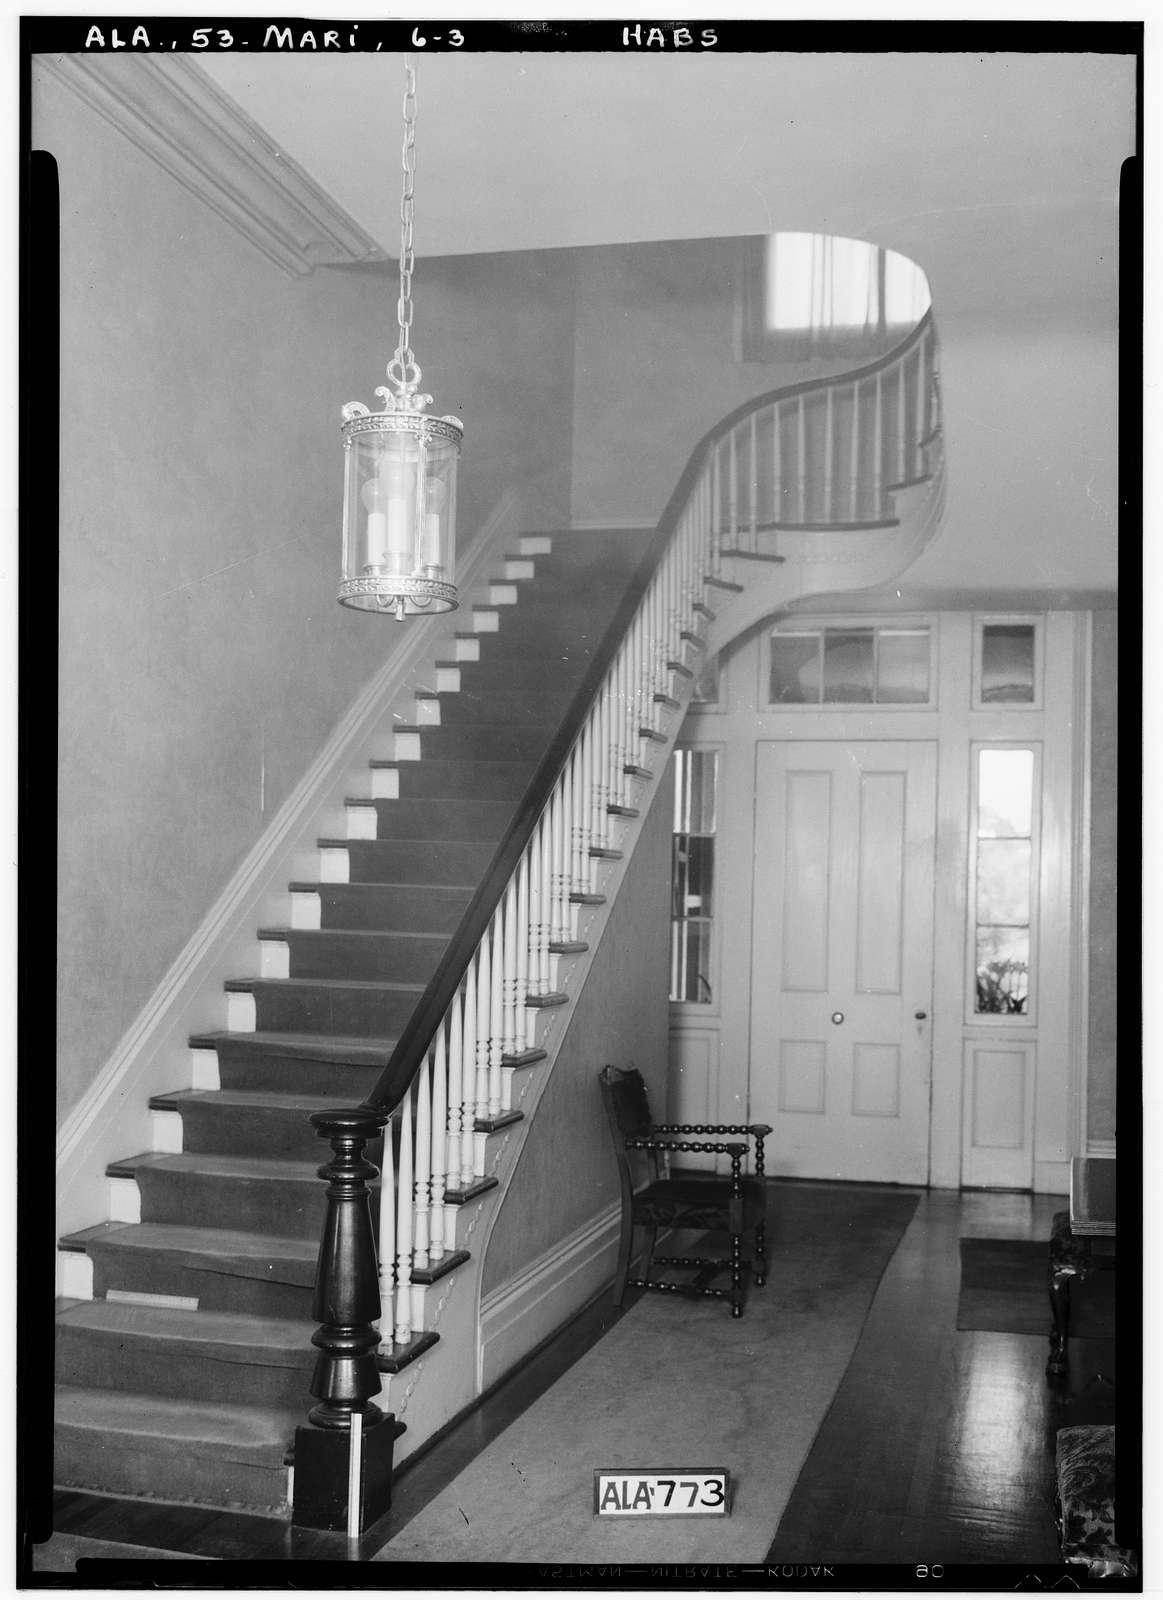 Whitsett-Hurt-Hanna House, 110 West Lafayette Street, Marion, Perry County, AL